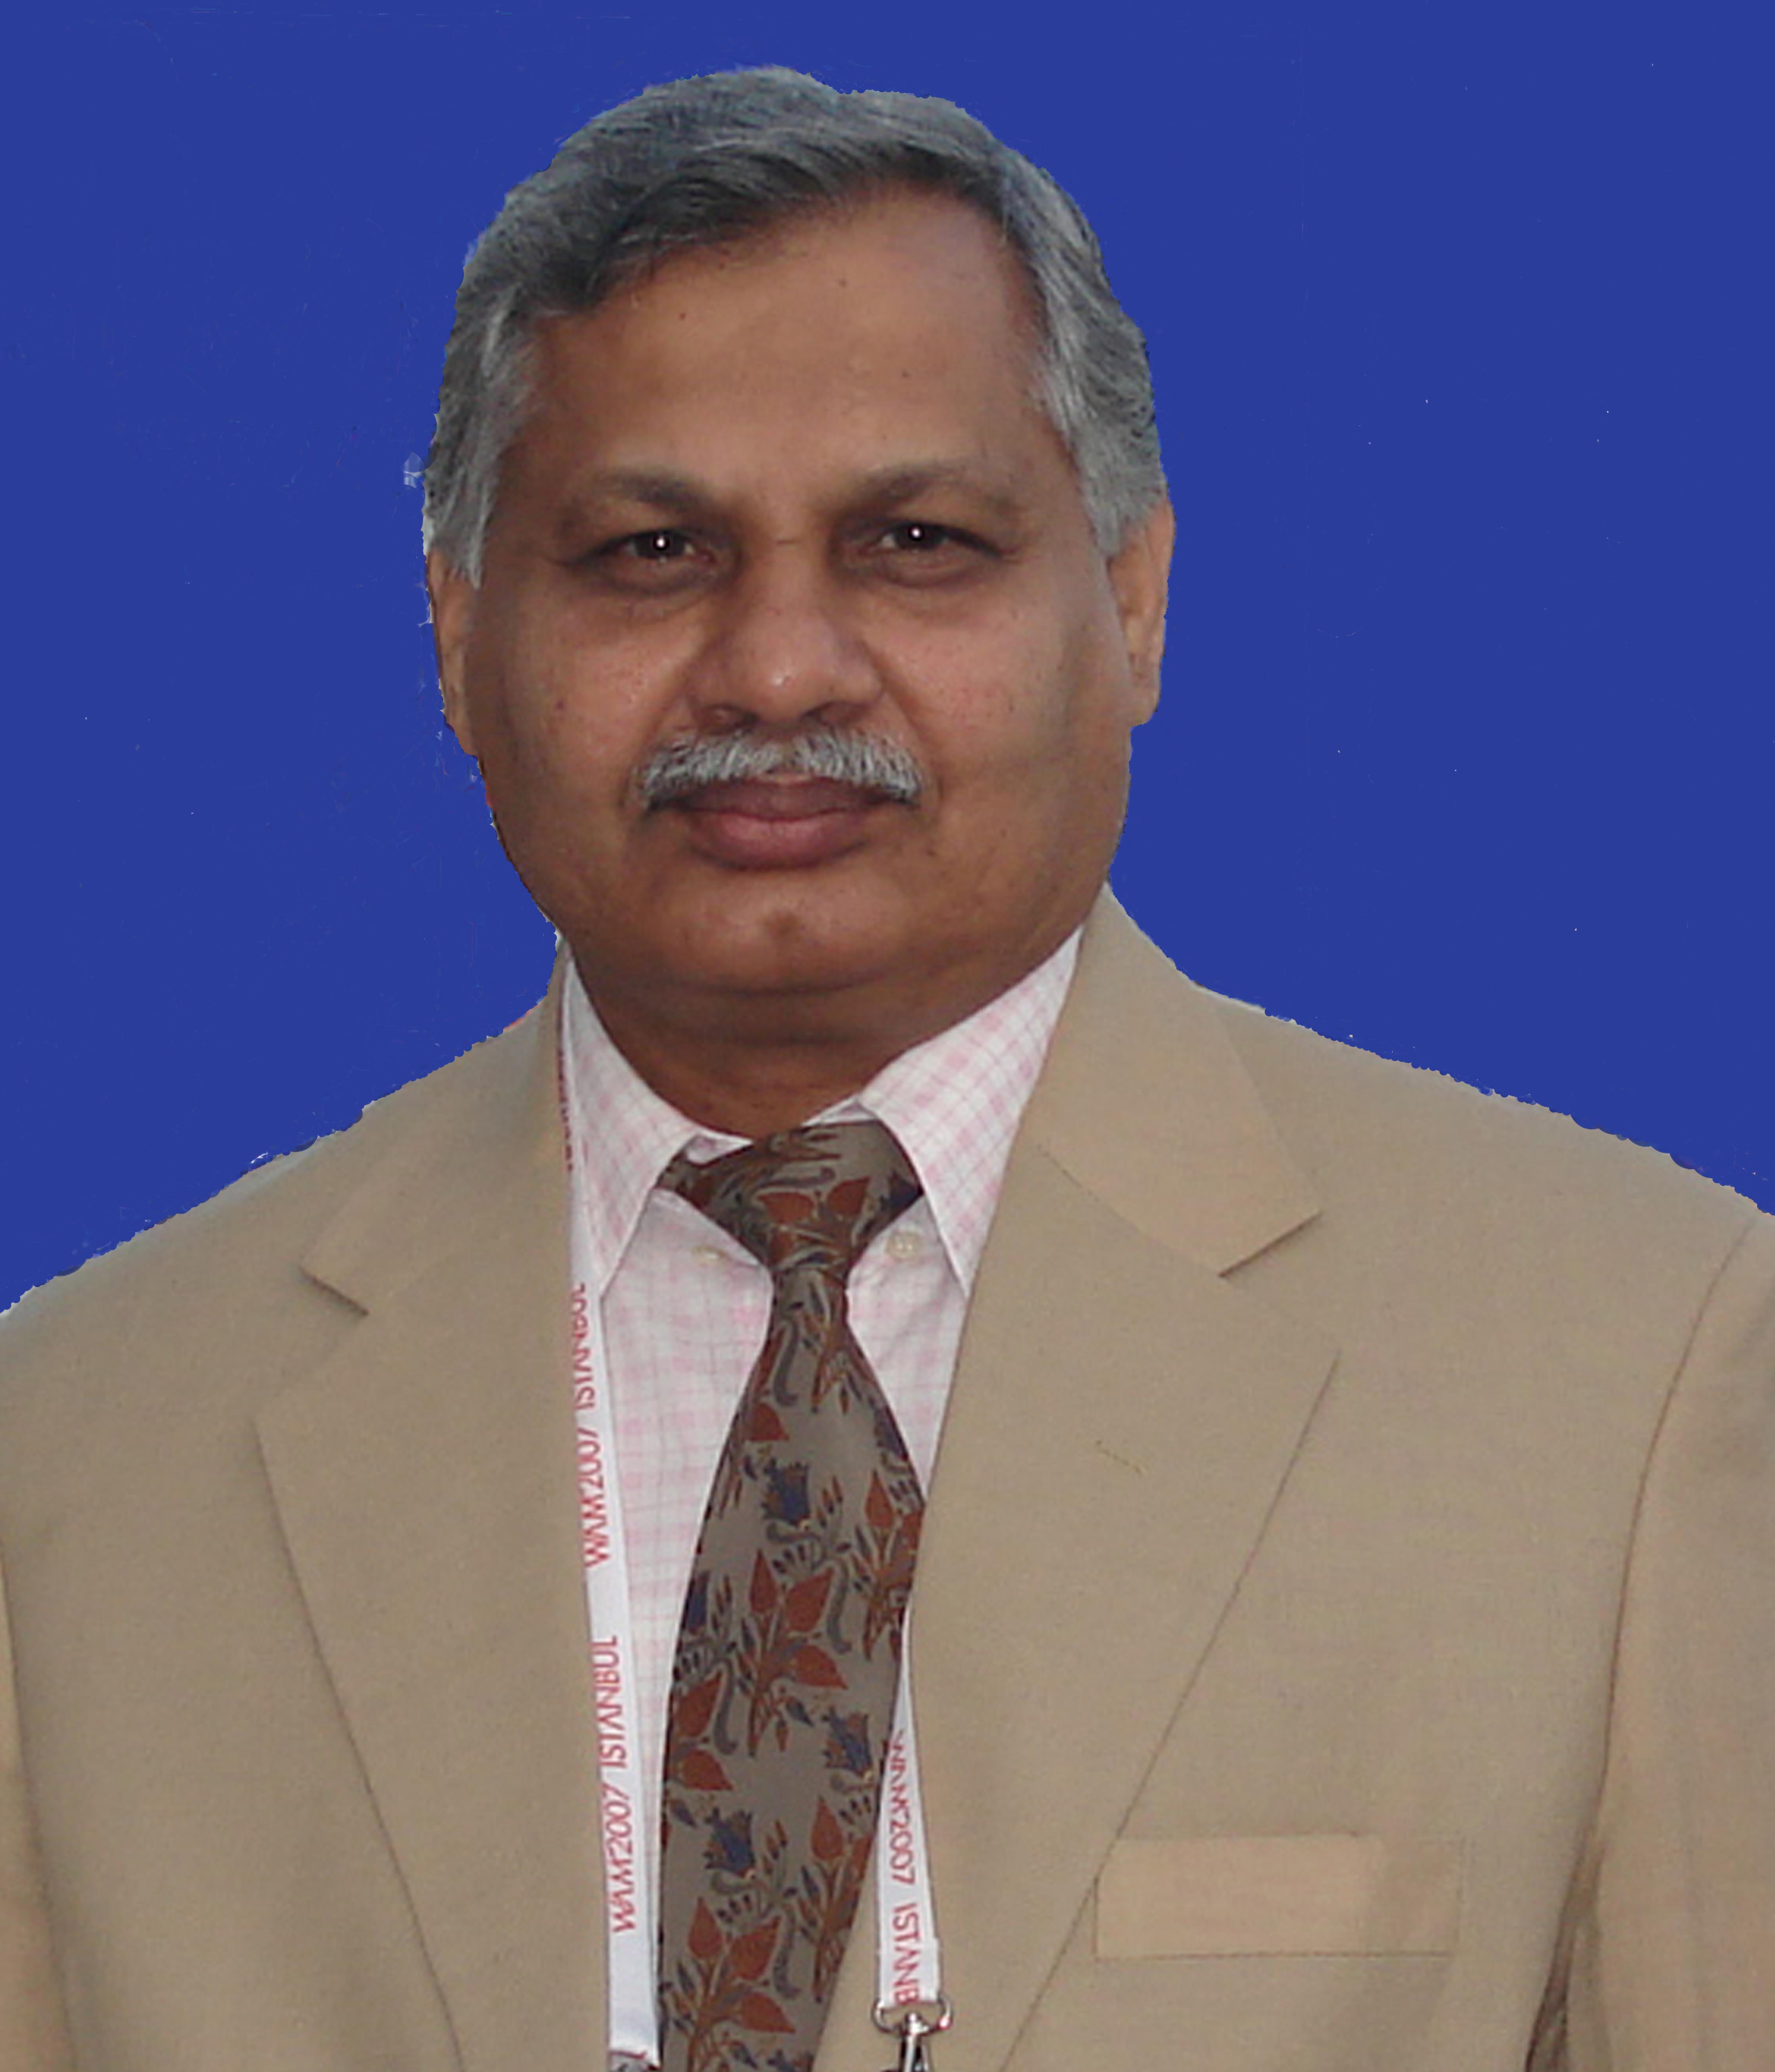 Prof. Nazim Bokhari' picture